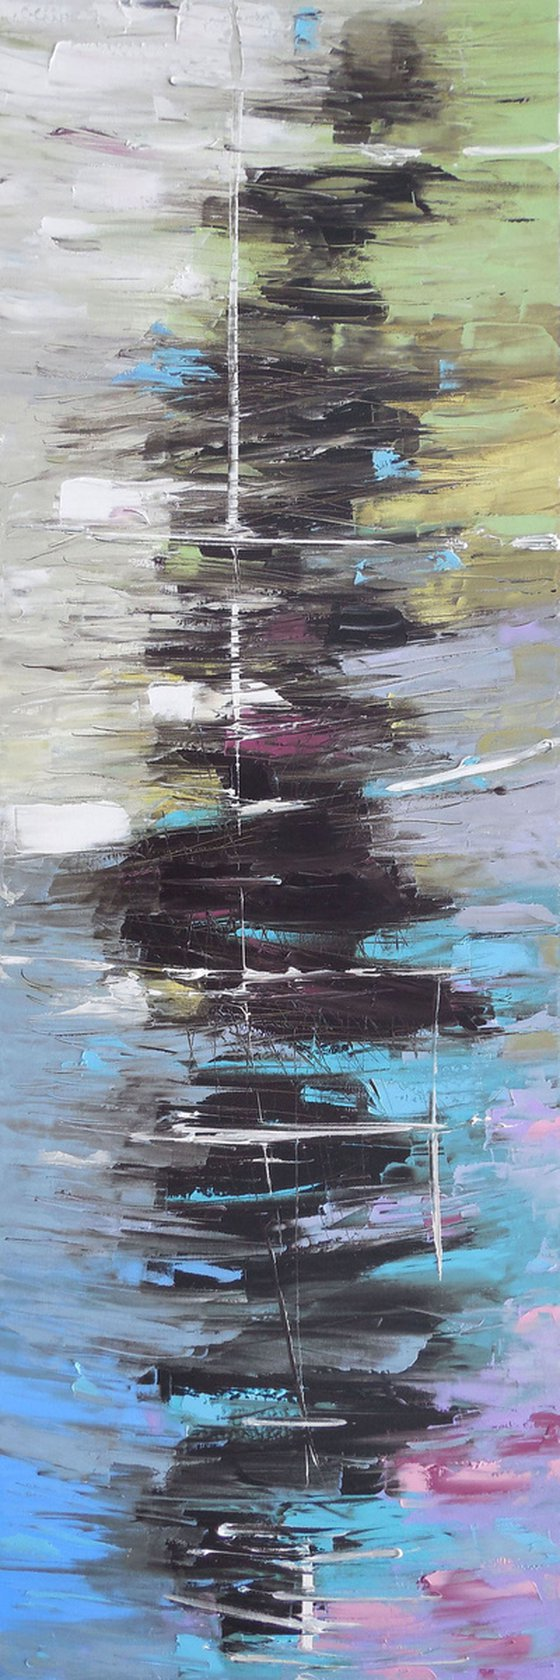 Reverberation - palette knife impasto painting abstract alla prima original artwork horizontal